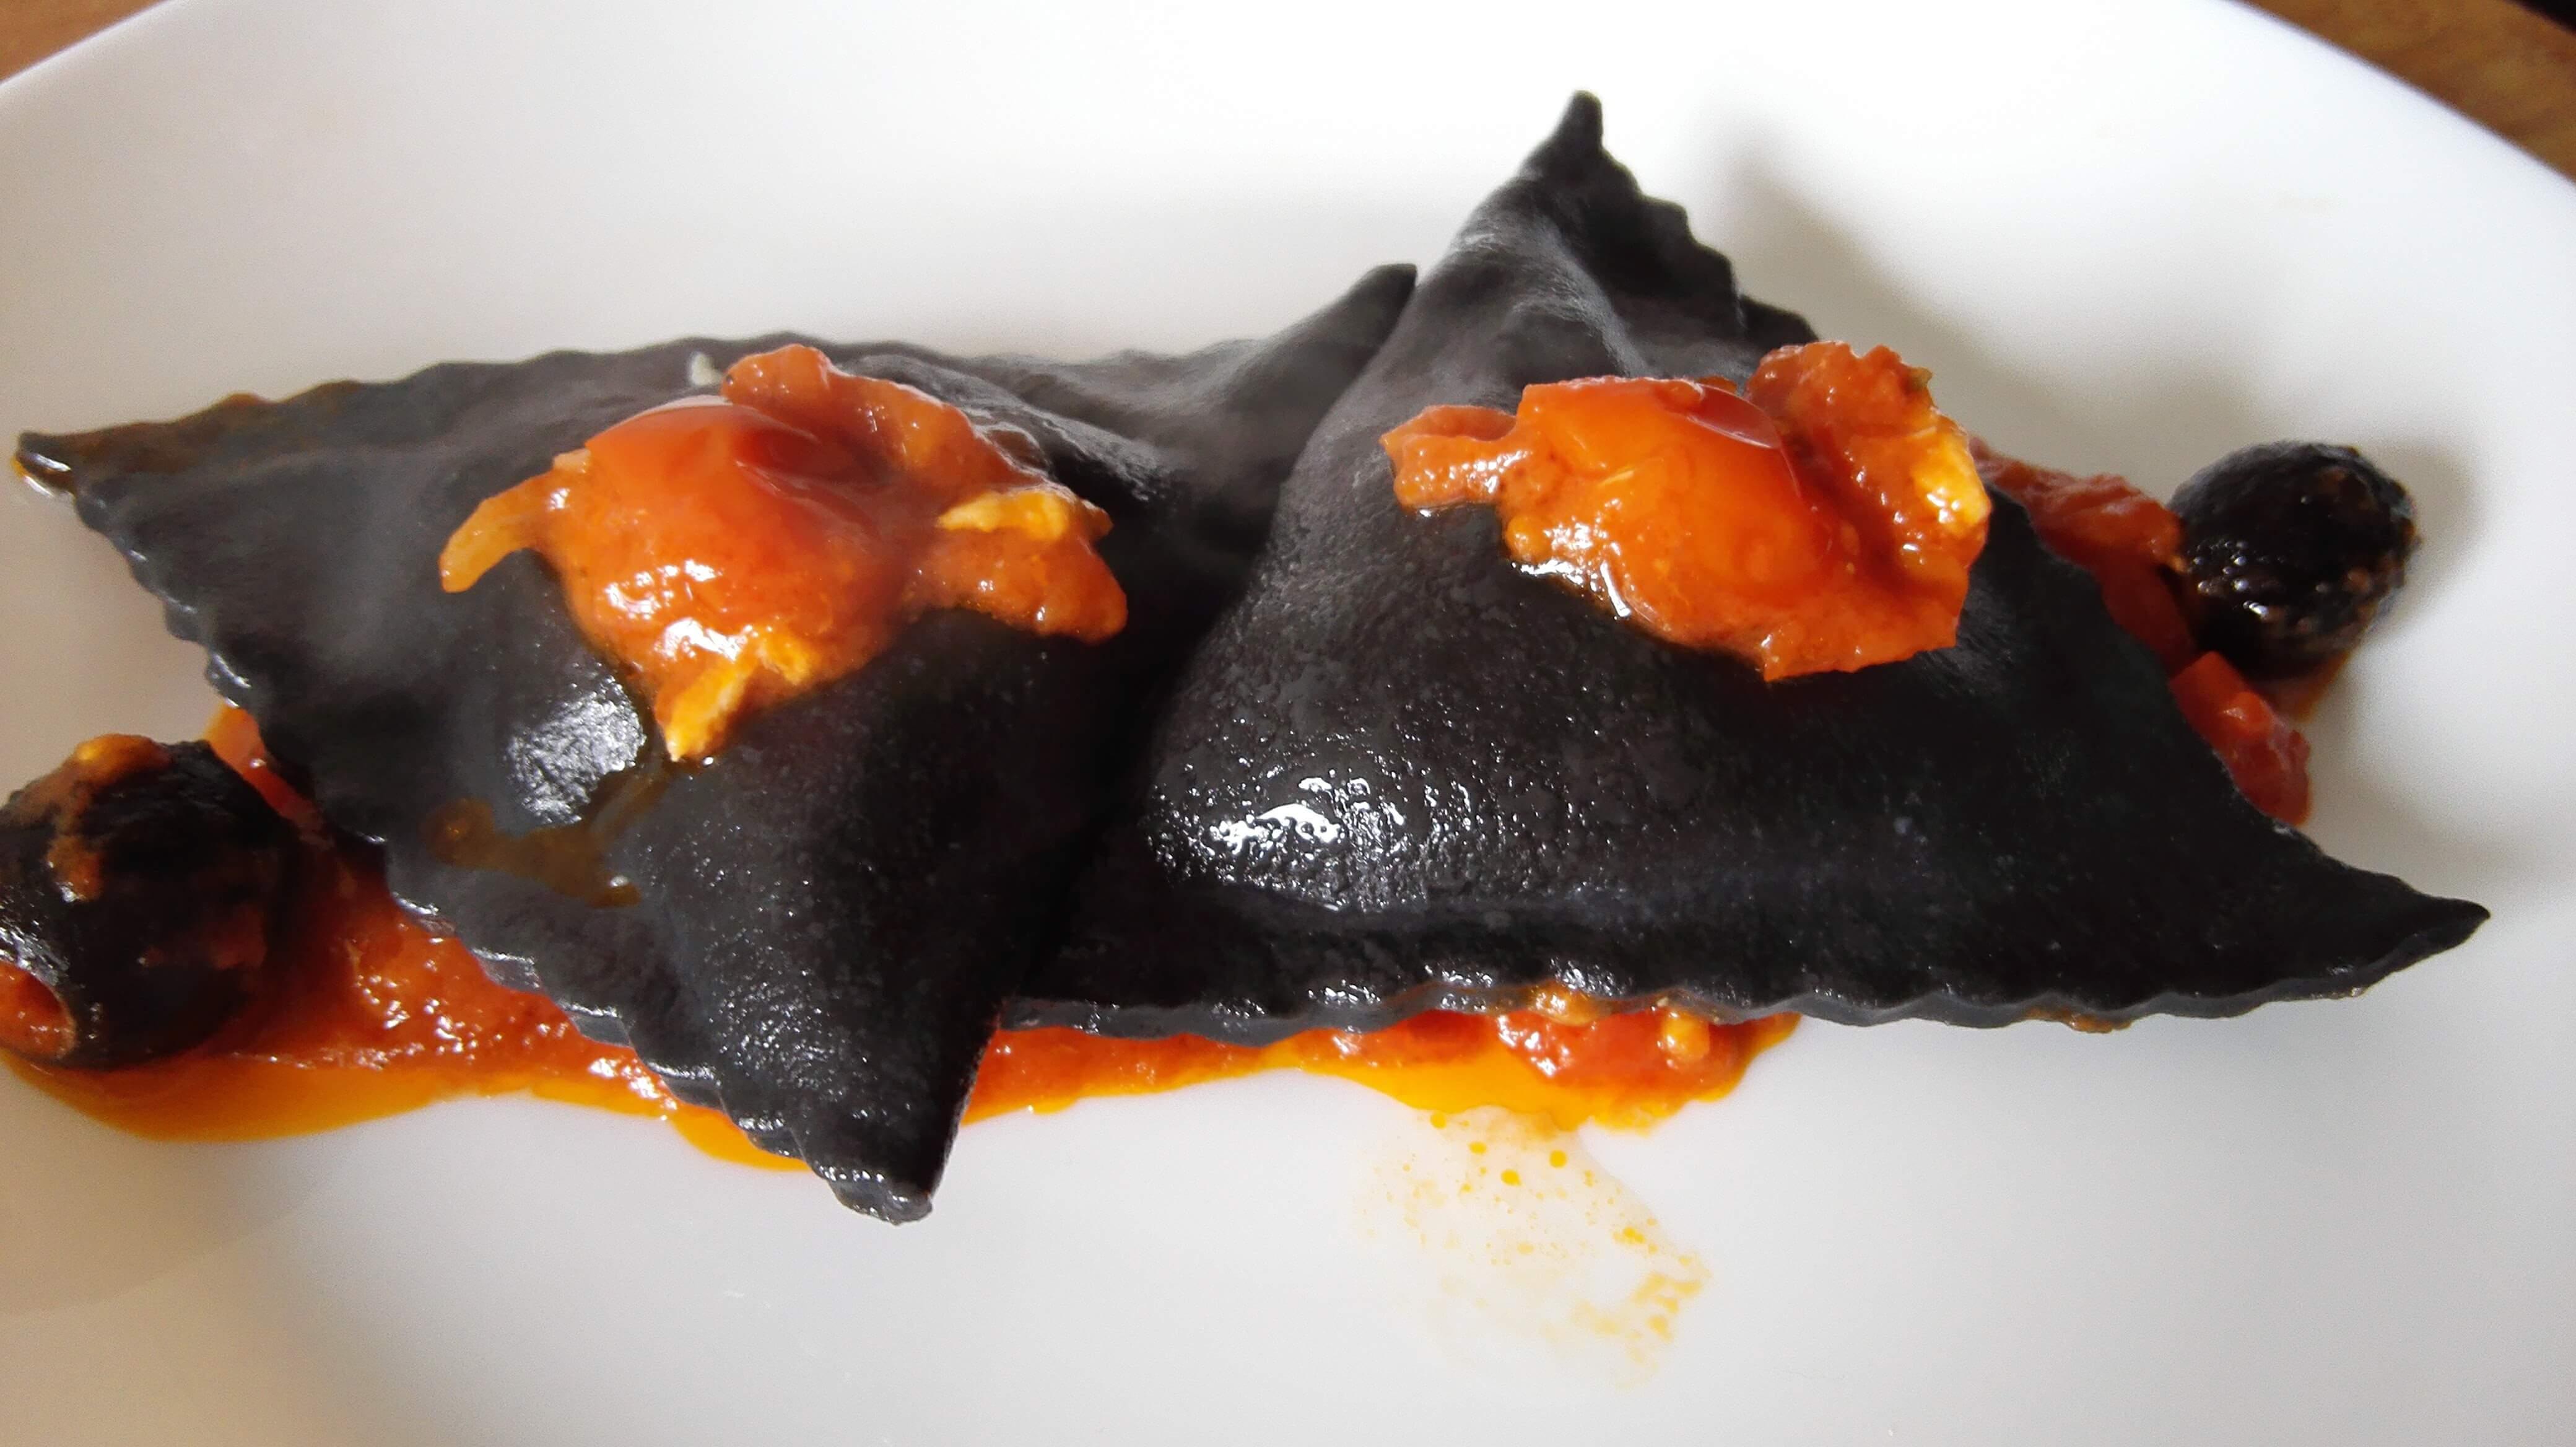 Ravioli al nero di Seppia, una ricetta di marblu